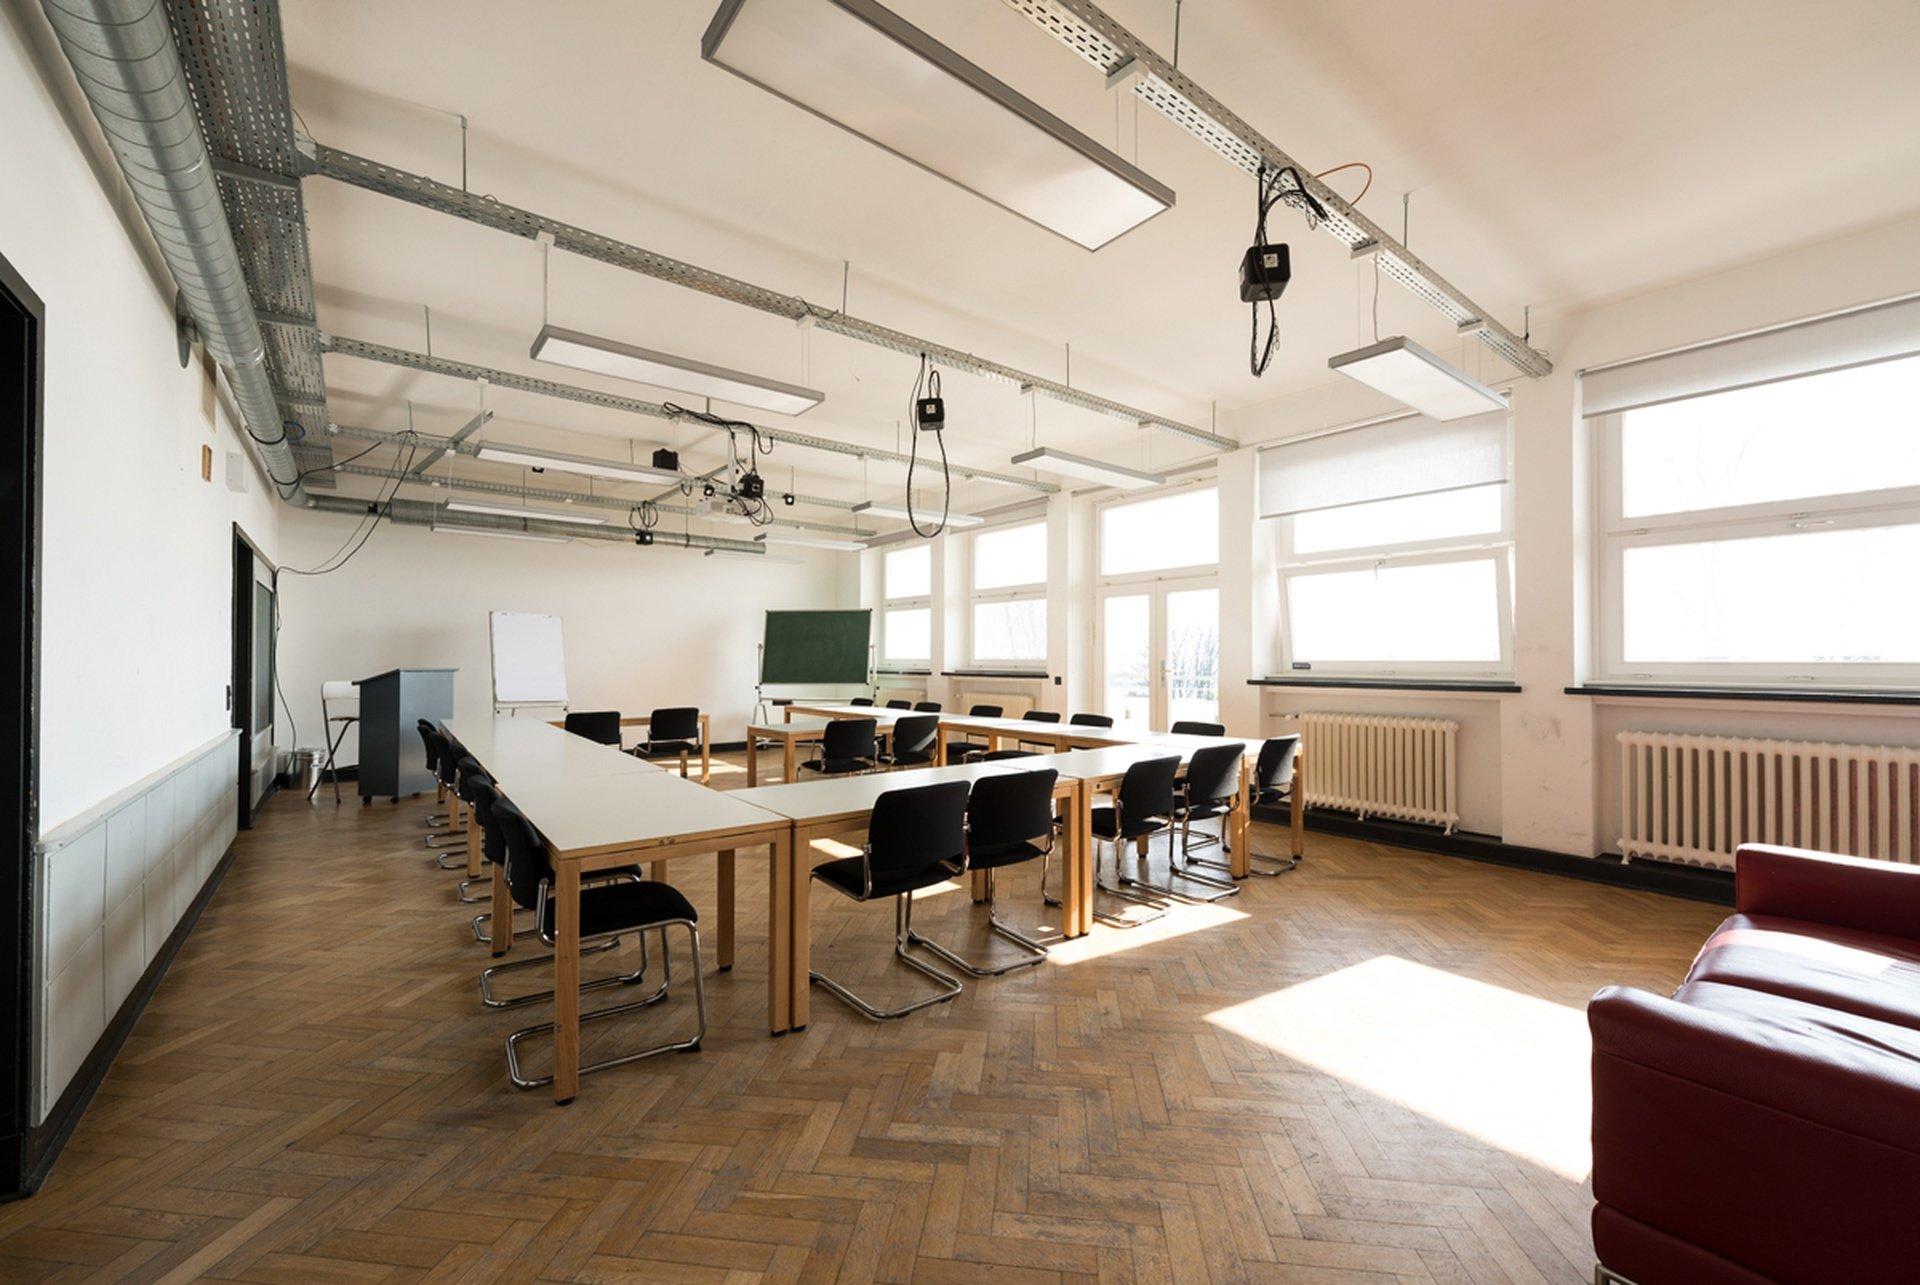 Hamburg training rooms Meetingraum Design Factory International Raum 03 image 0